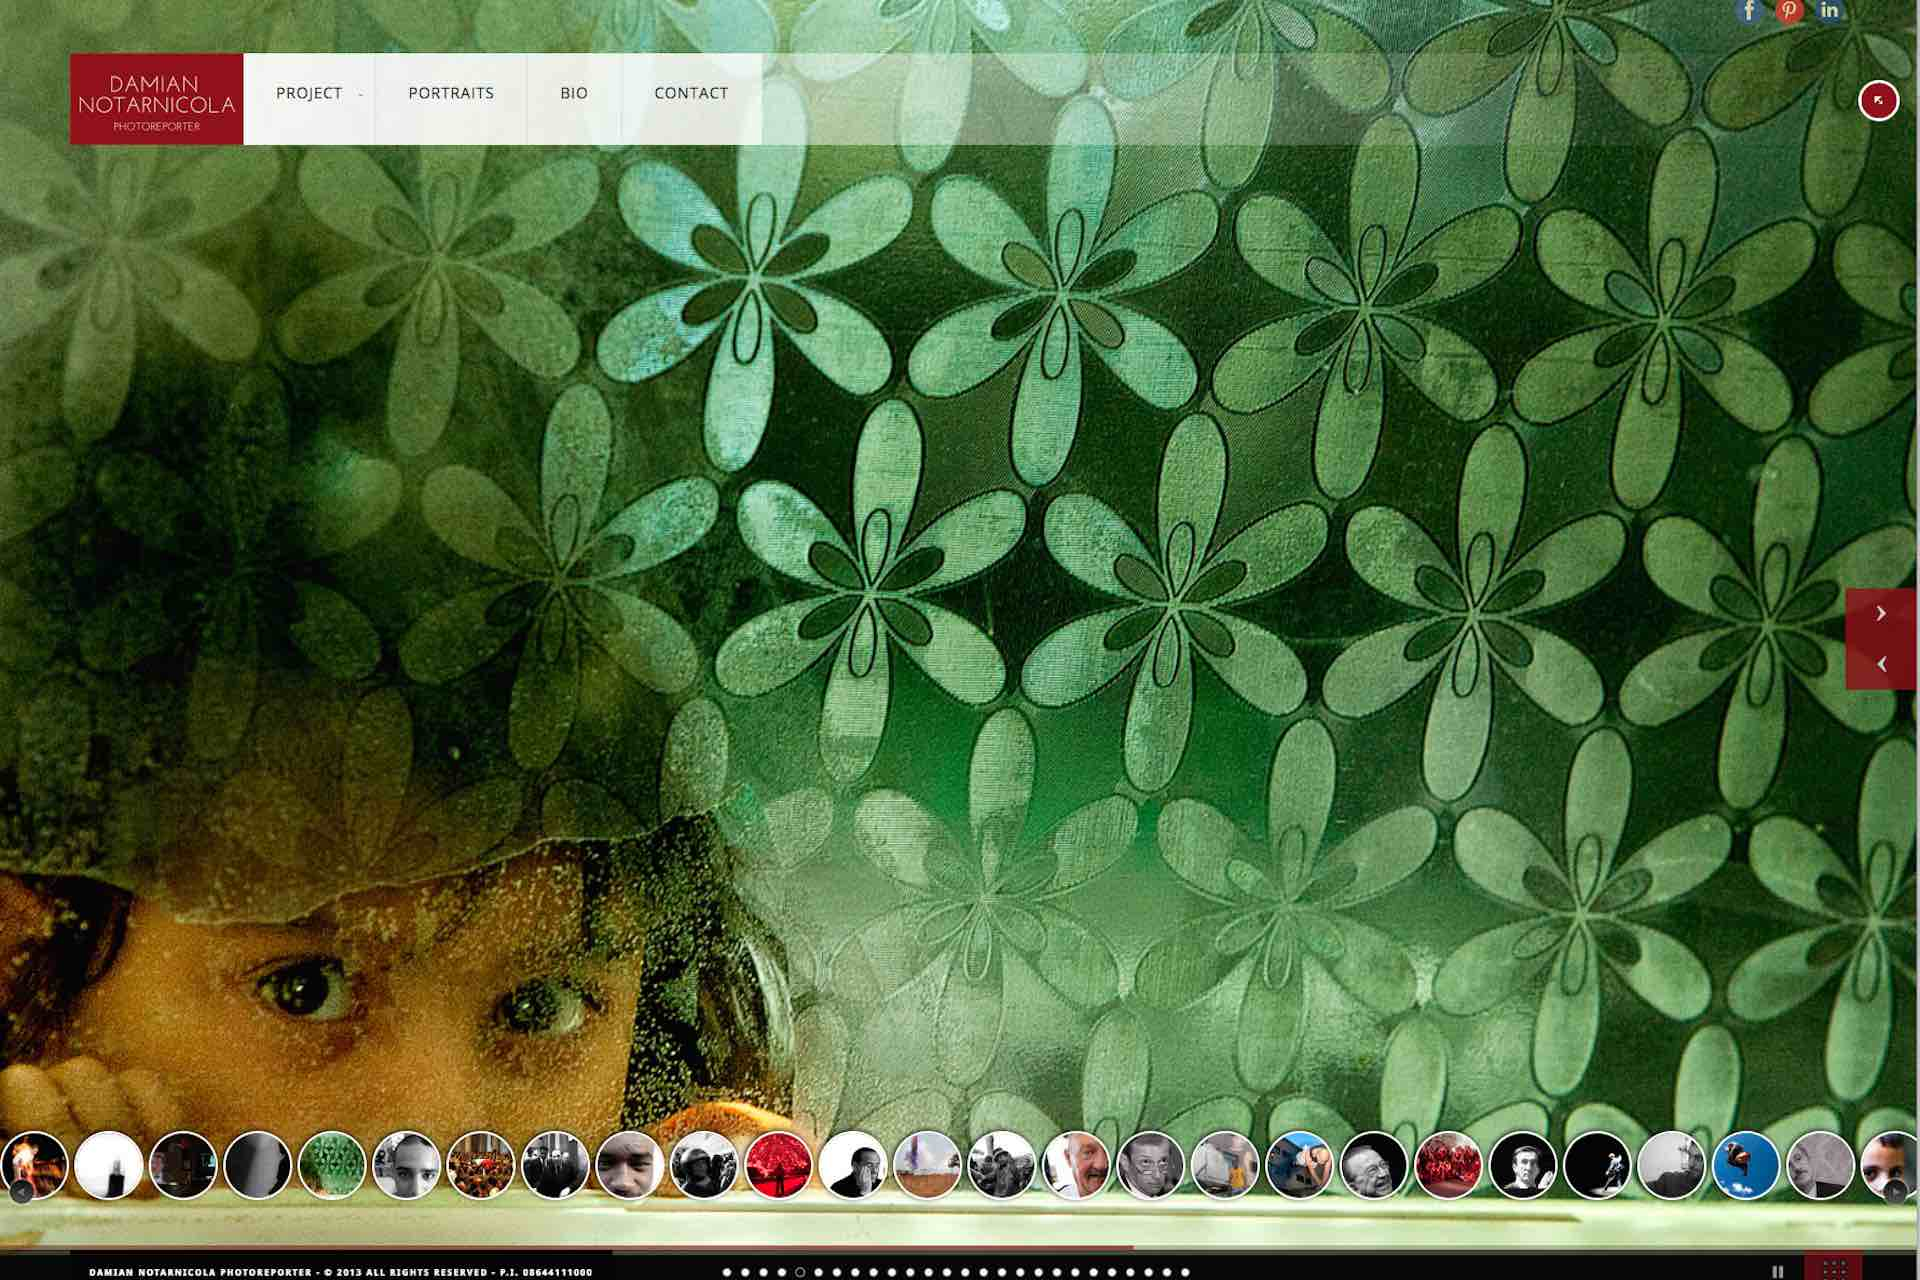 damian-notarnicola-sito-web